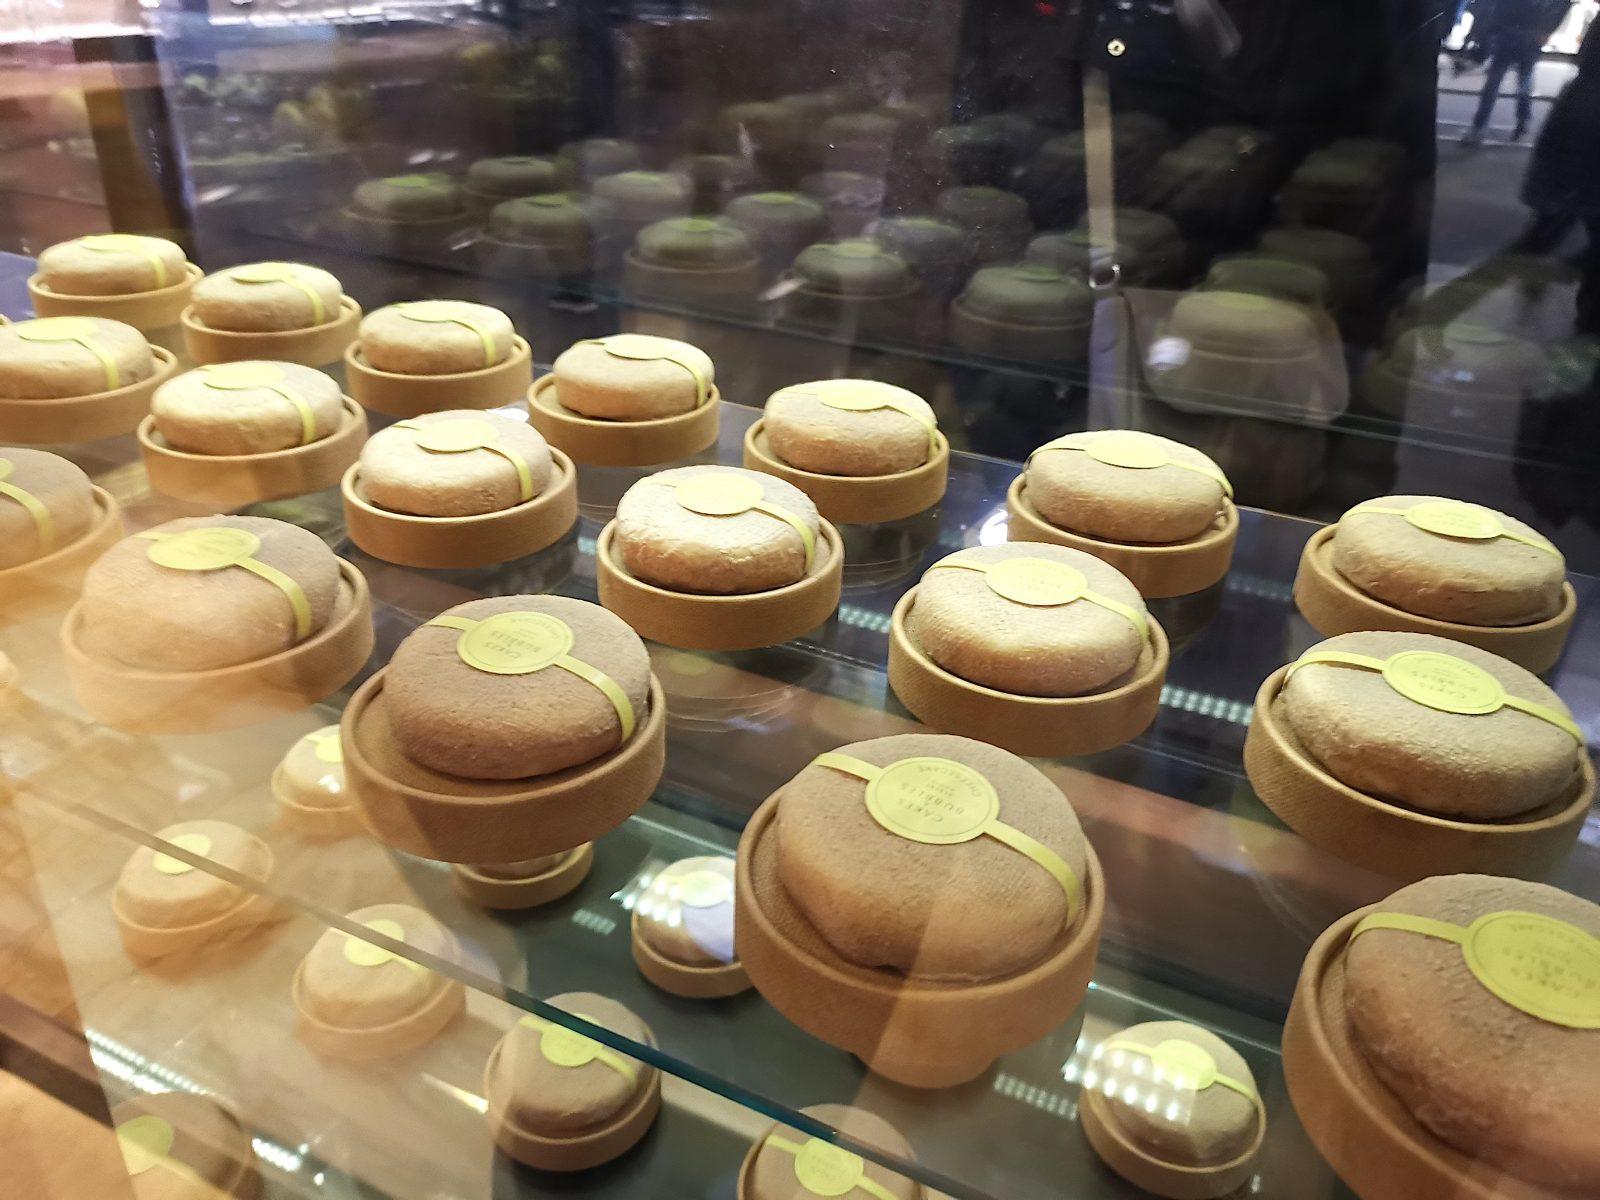 Shelf of The Cheesecake by Albert Adria London